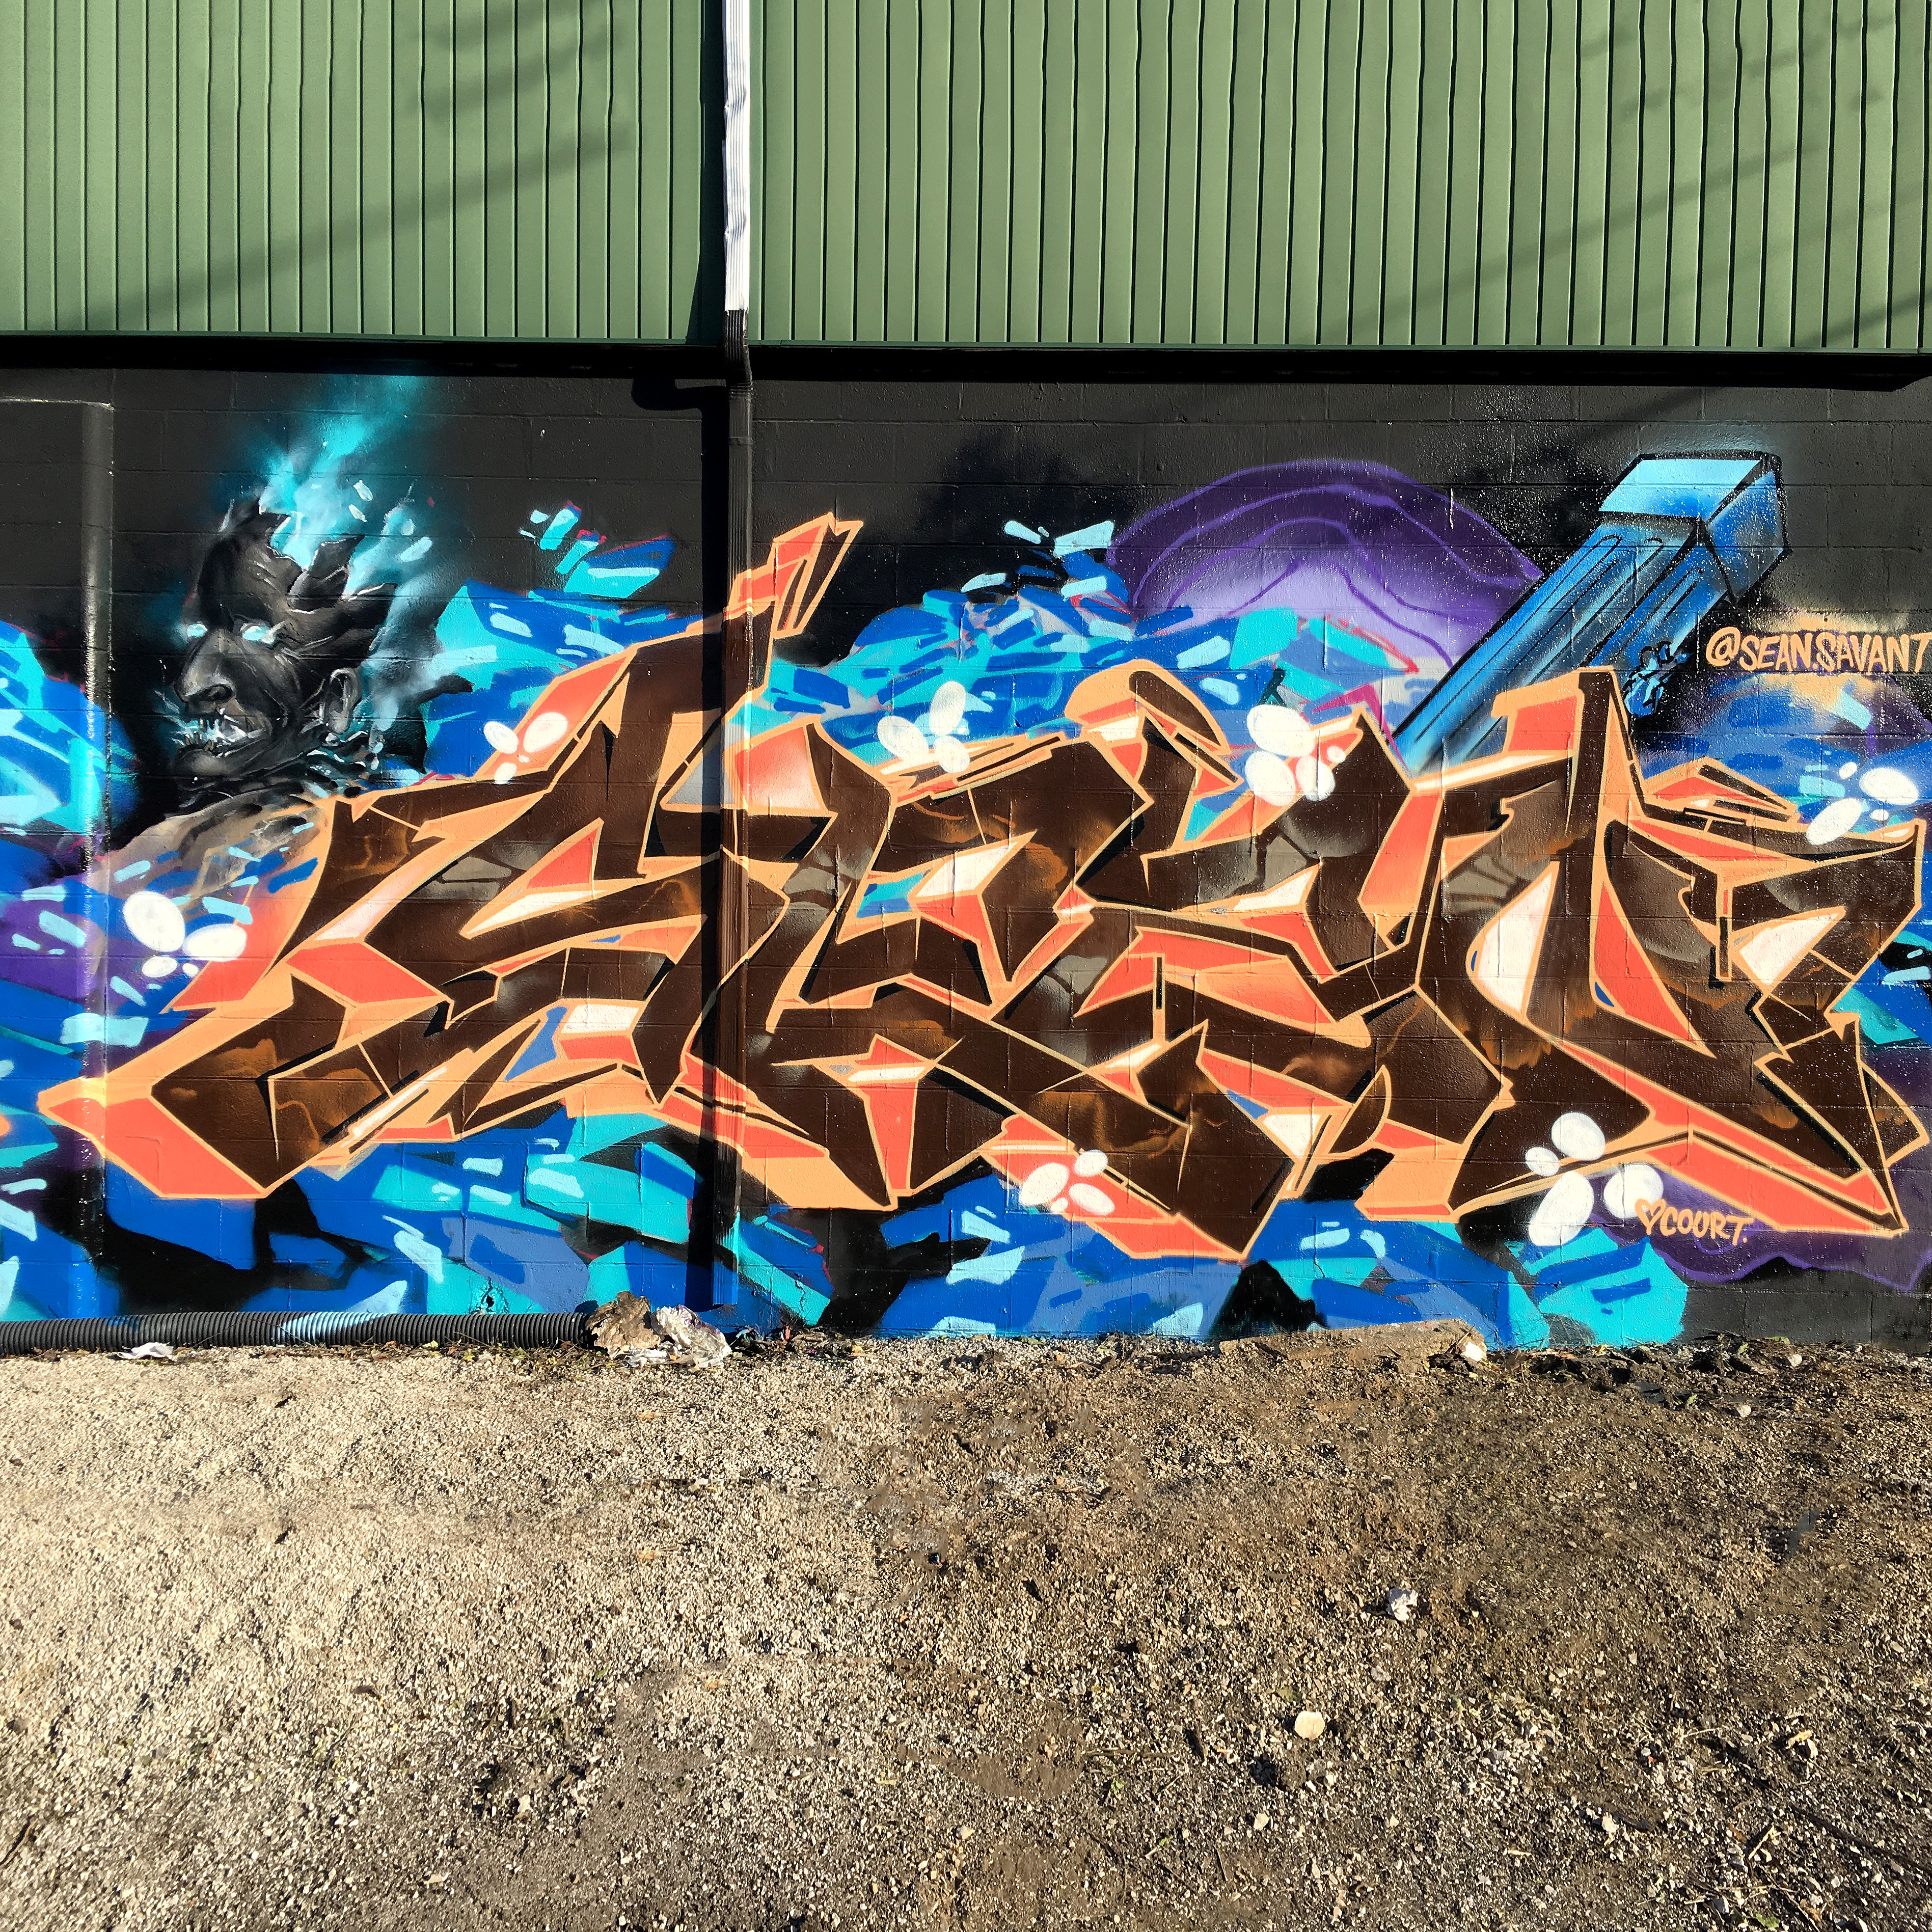 Sean Savant Indianapolis Graffiti Writer Interview